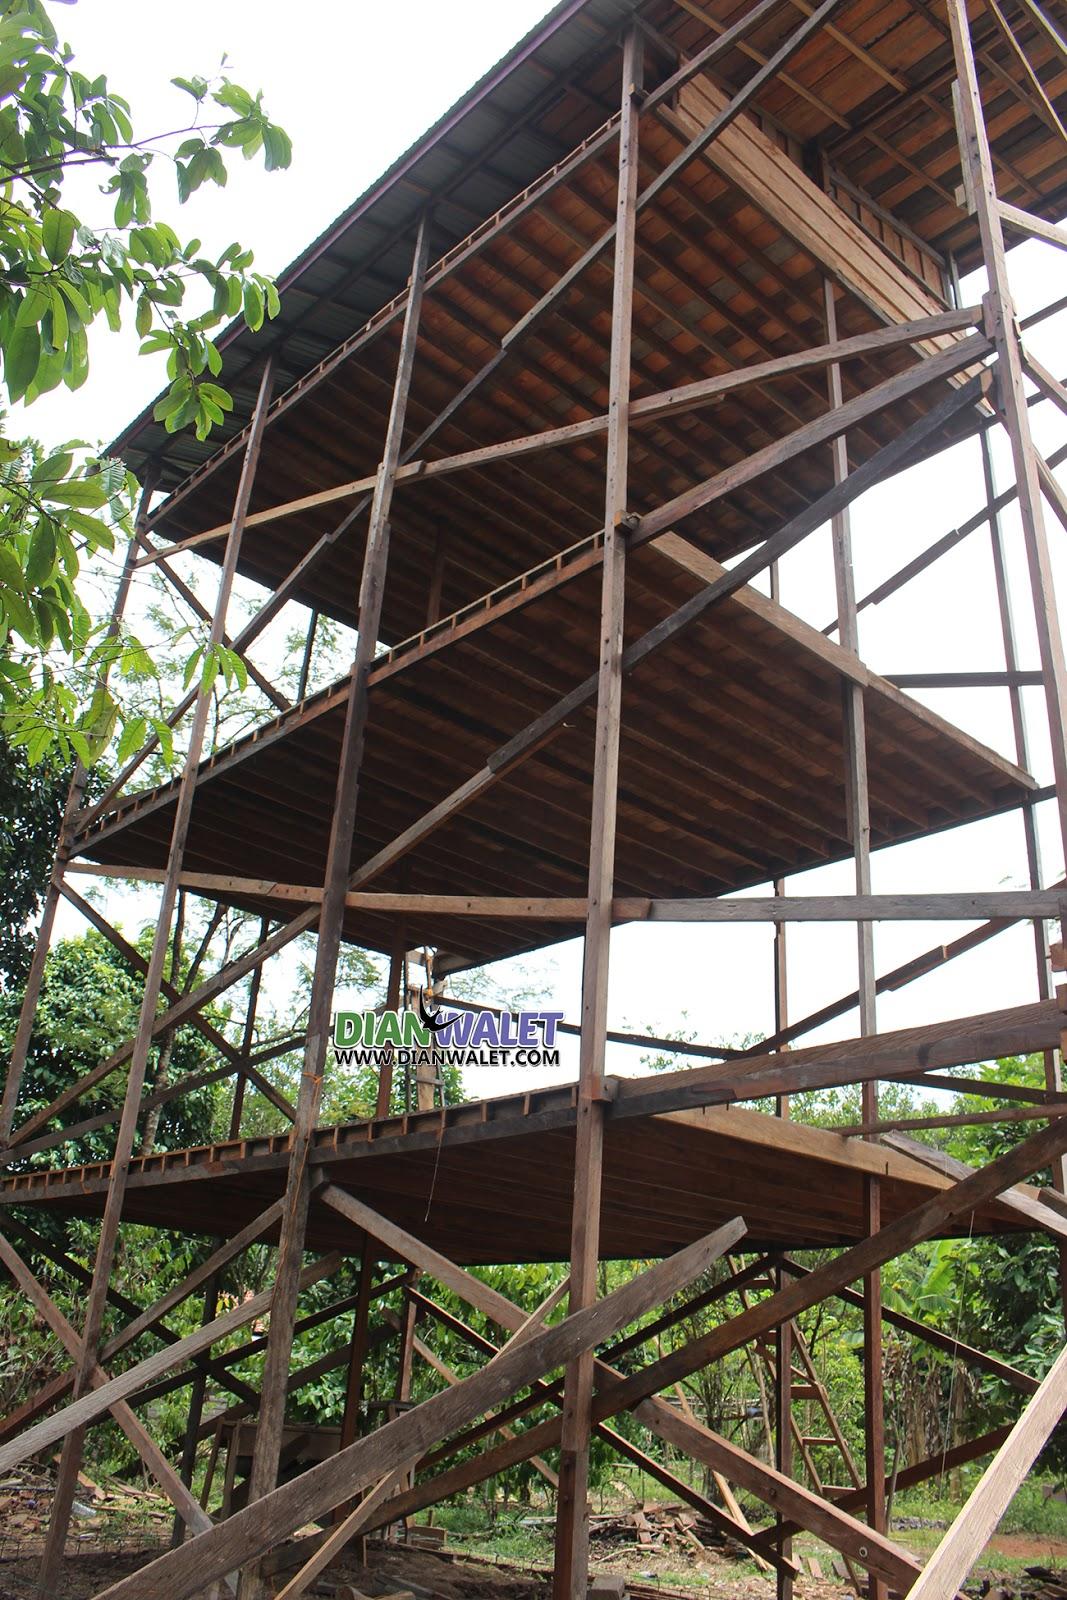 Rumah Sarang Burung Walet Dari Rangka Ulin  DIAN WALET